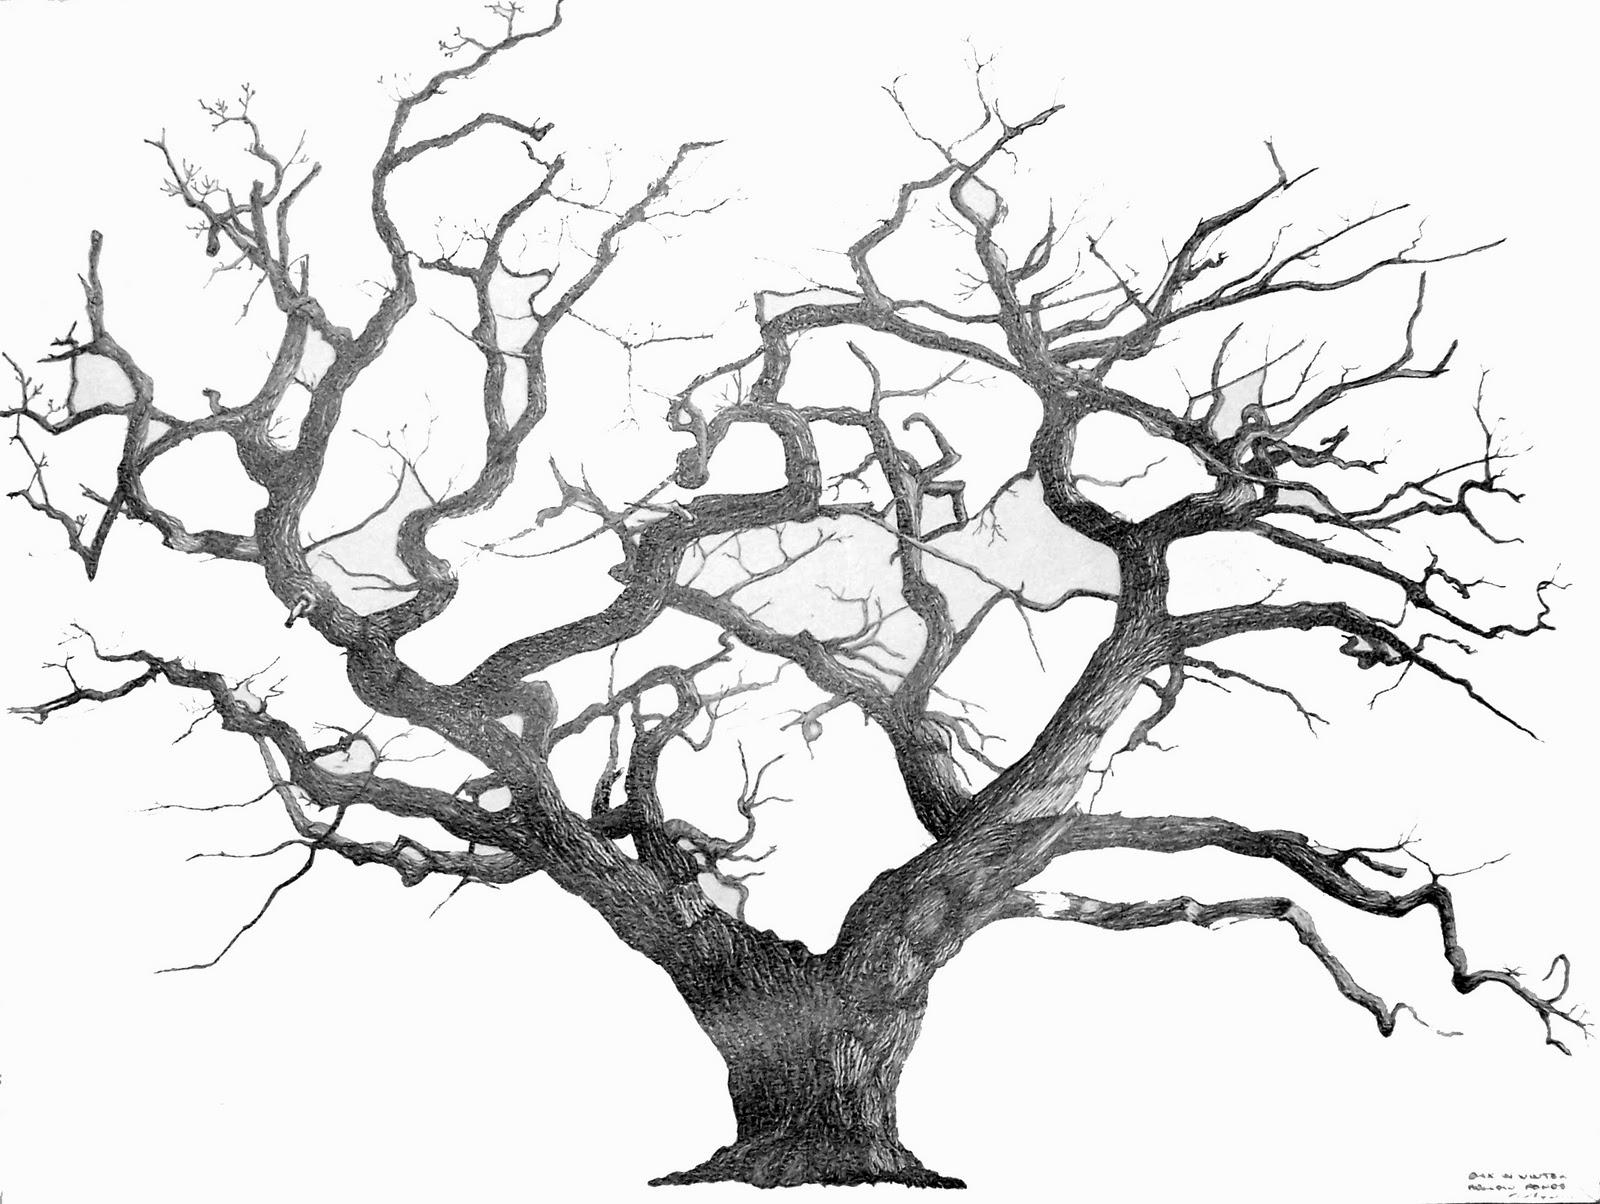 Drawn roots More! Tree Drawings Drawing Drawing